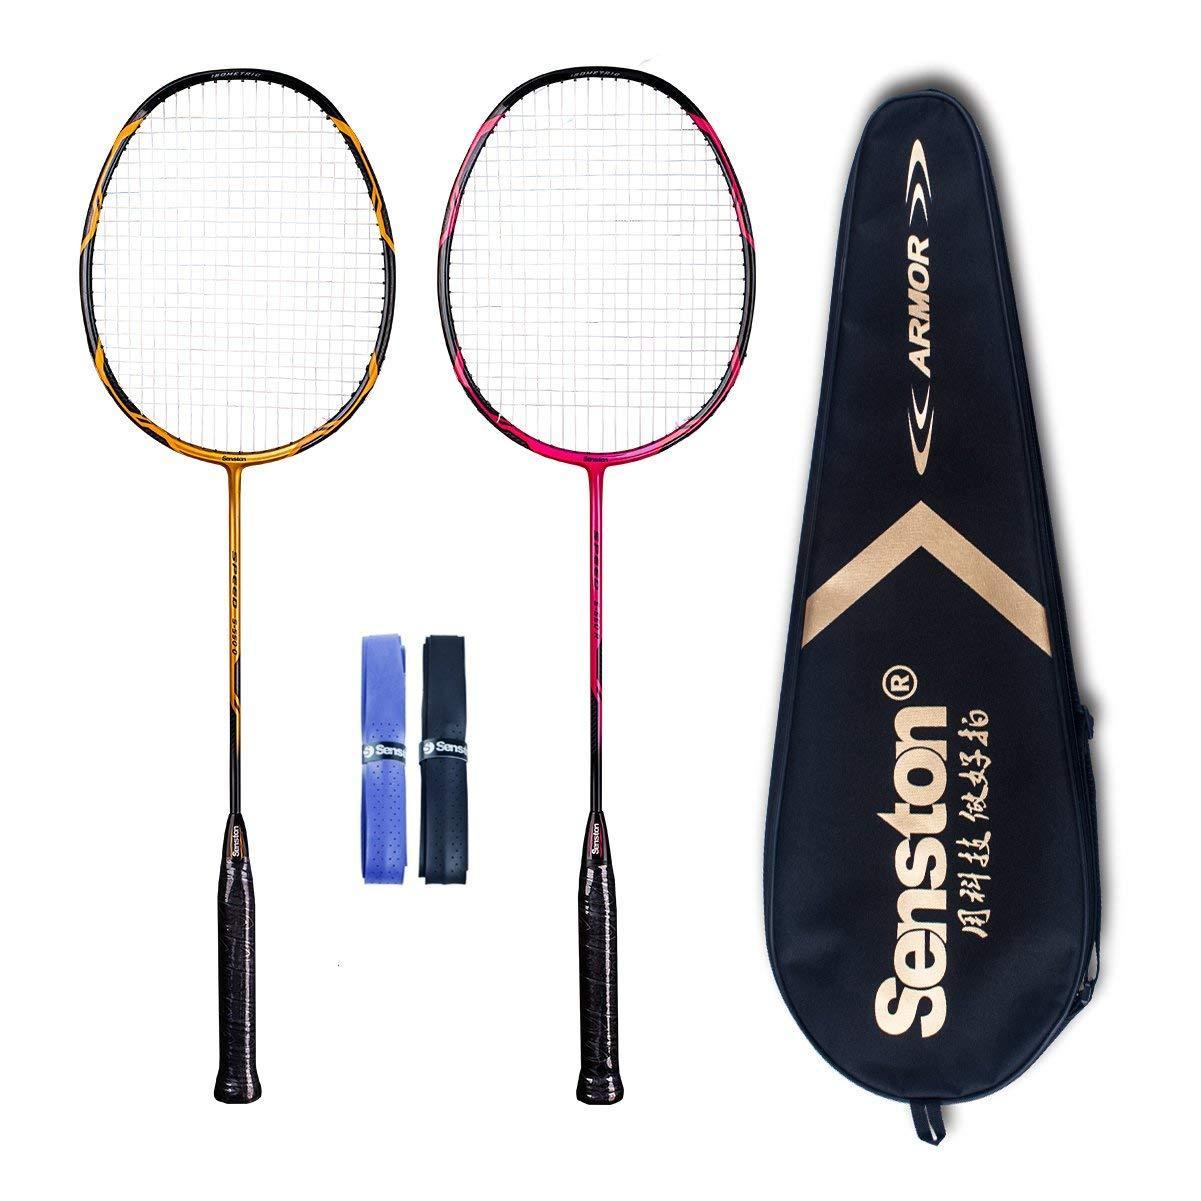 Senston - High Grade 2 Player Graphite Badminton Racket Set - Including 1 Badminton Bag/2 Rackets/2 Grip(red+Yellow) by Senston (Image #1)